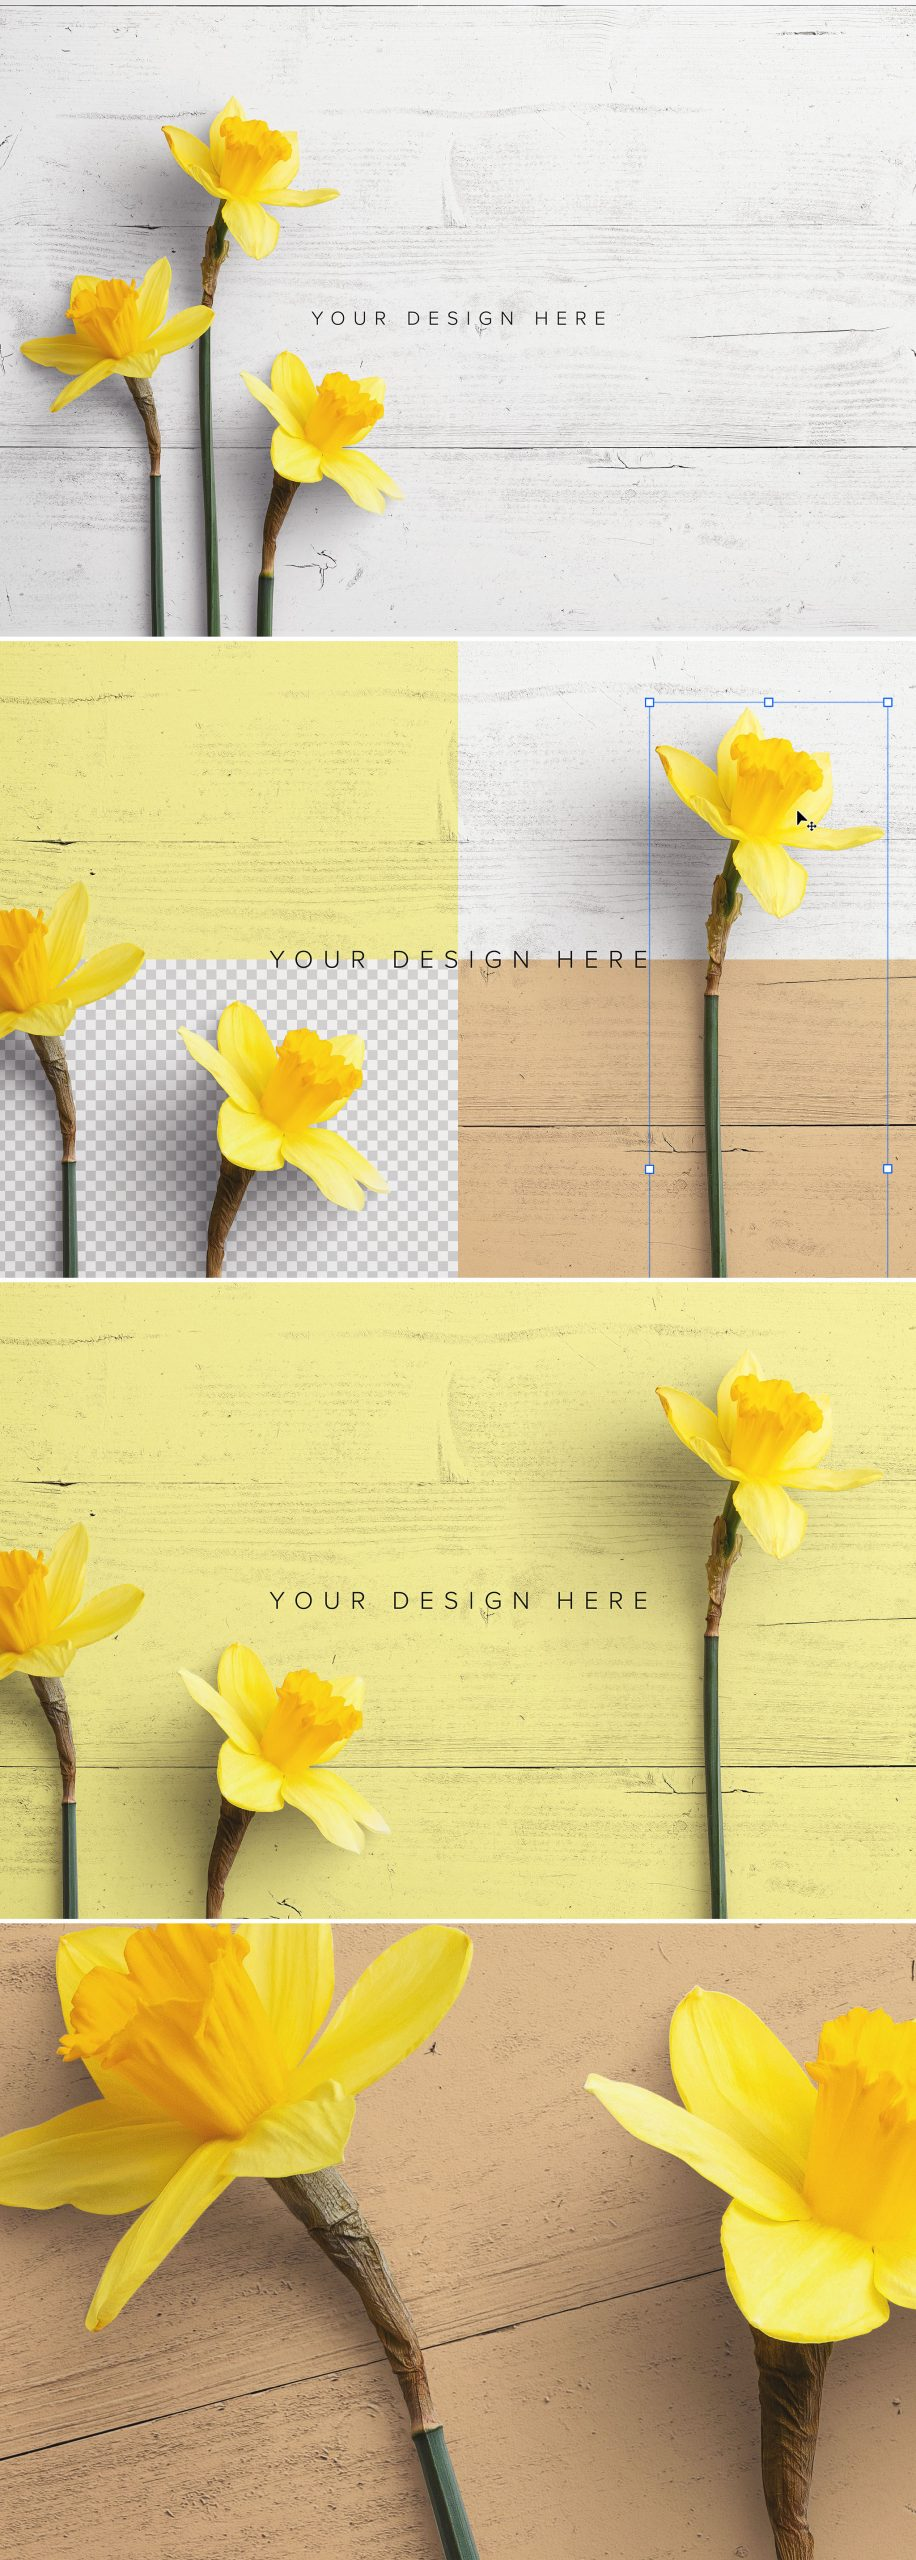 Daffodils Custom Scene Creator Template 4Preview1